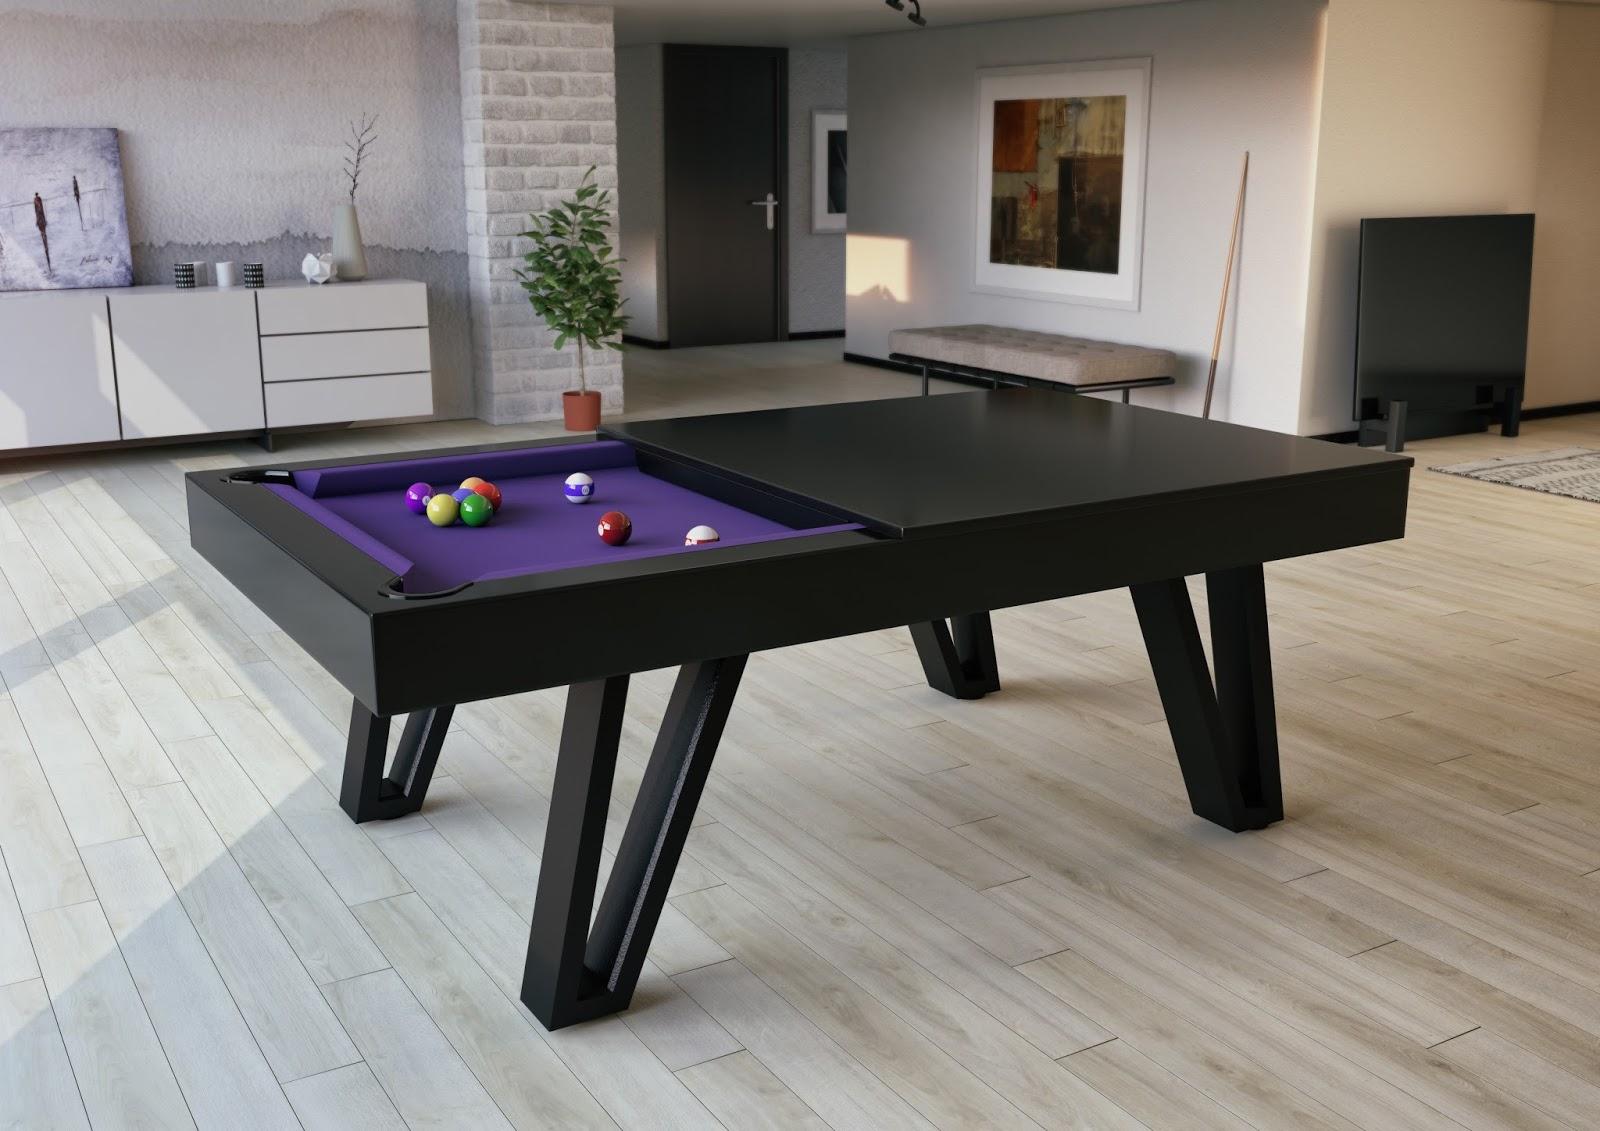 fabricant de billards osmoz le nouveau billard table. Black Bedroom Furniture Sets. Home Design Ideas